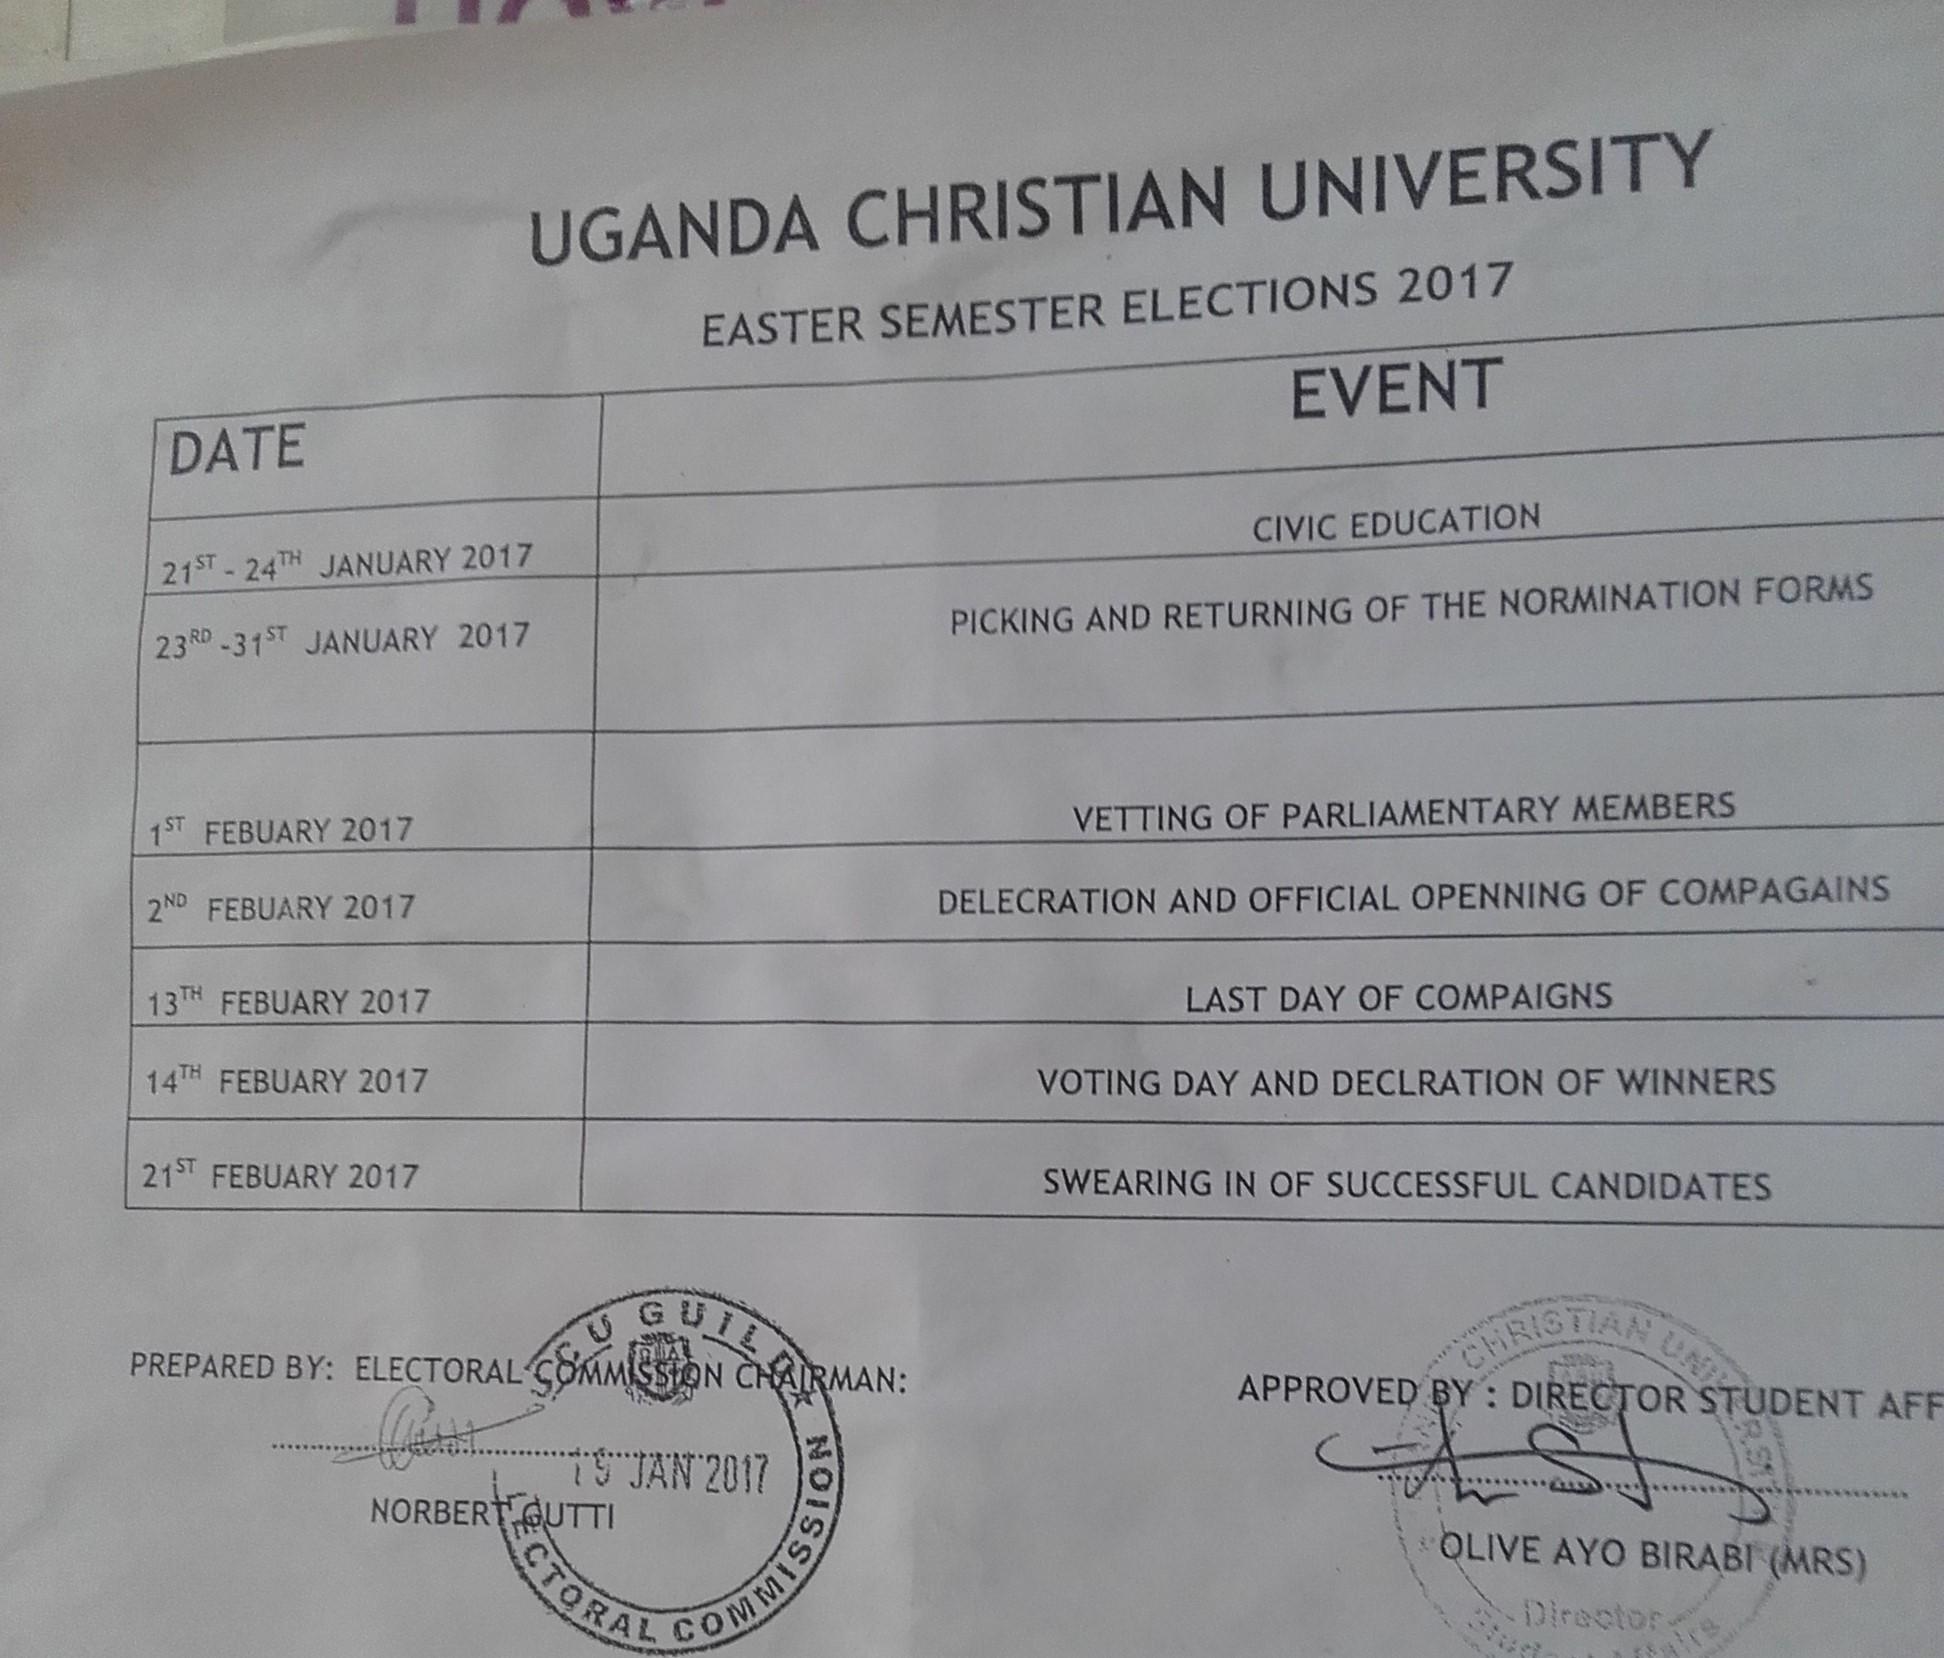 UCU electoral commission sets timeline for second phase of